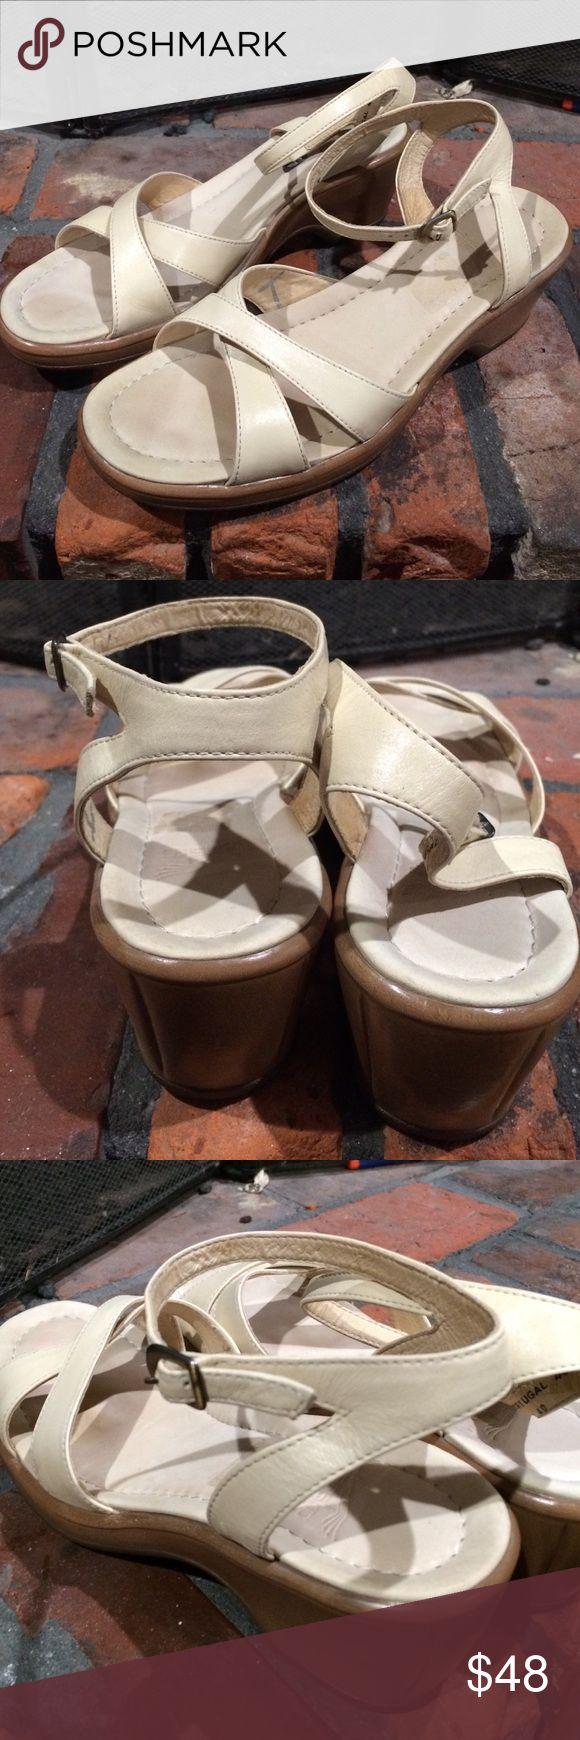 Dansko wedge Strappy heels size 40 Dansko wedge Strappy heels size 40.  Cream color leather  uppers.  Super comfortable.  2 inch heel. Dansko Shoes Sandals